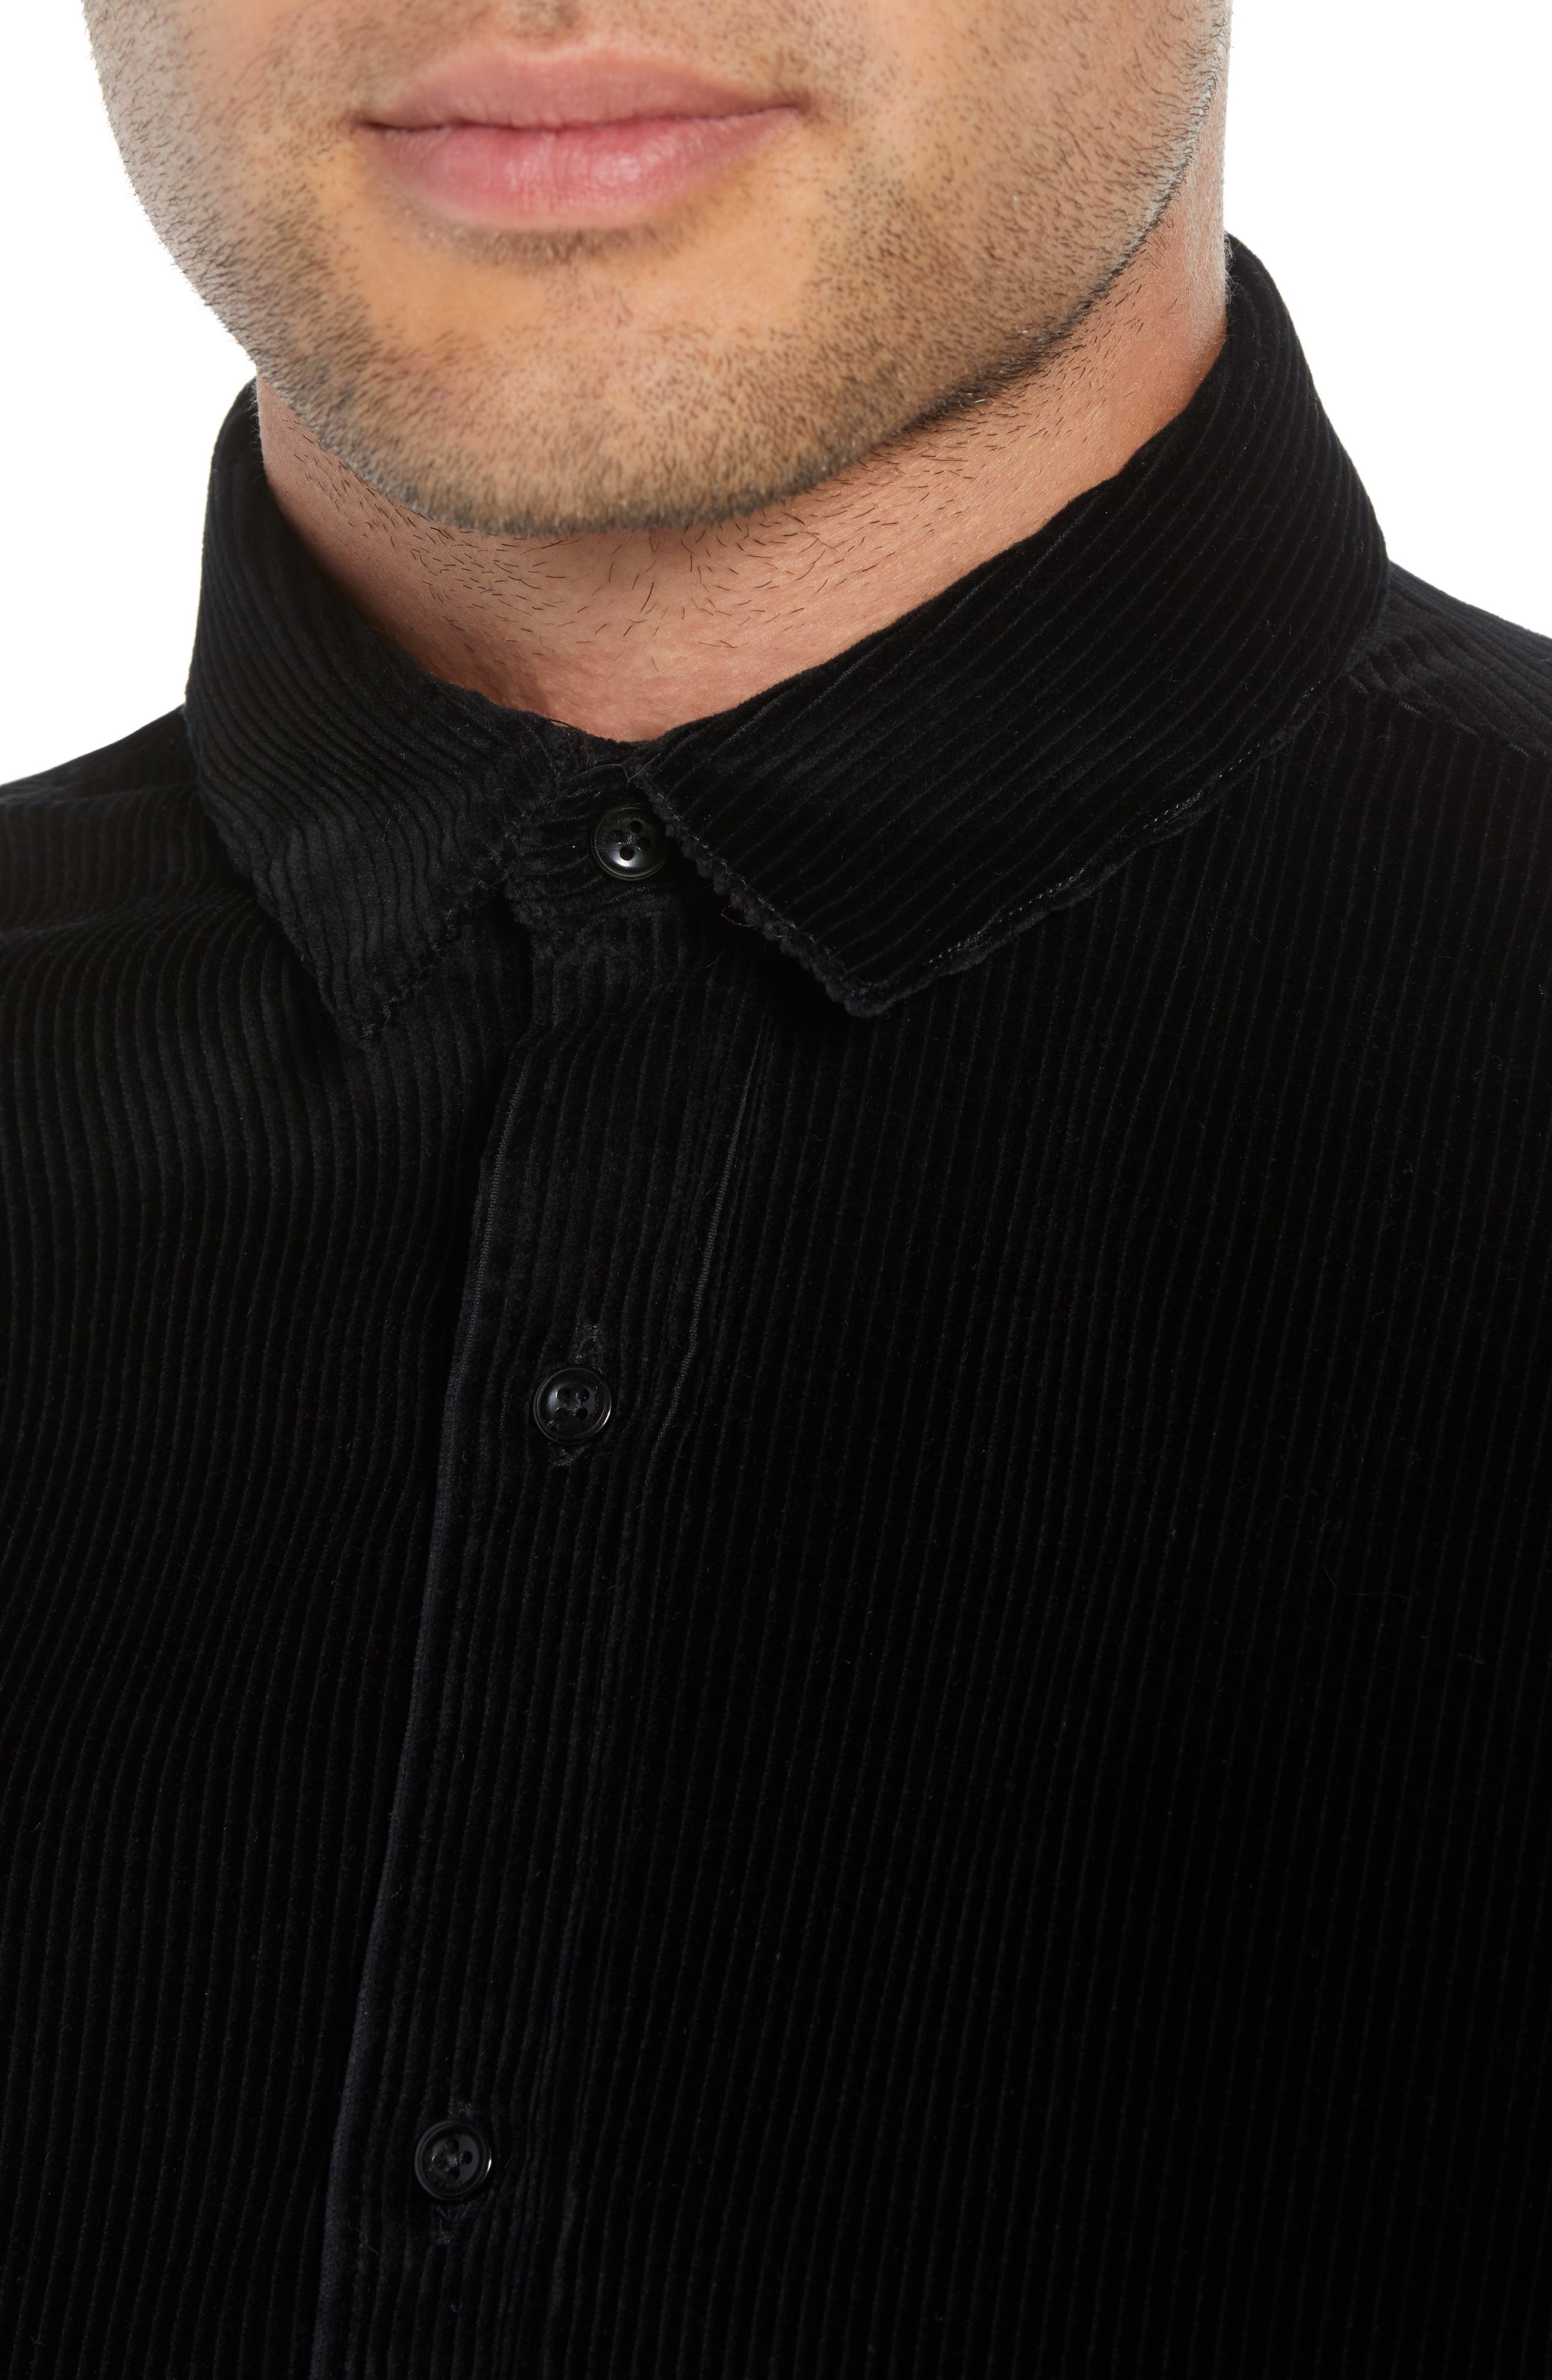 THE KOOPLES,                             Regular Fit Corduroy Shirt,                             Alternate thumbnail 2, color,                             001